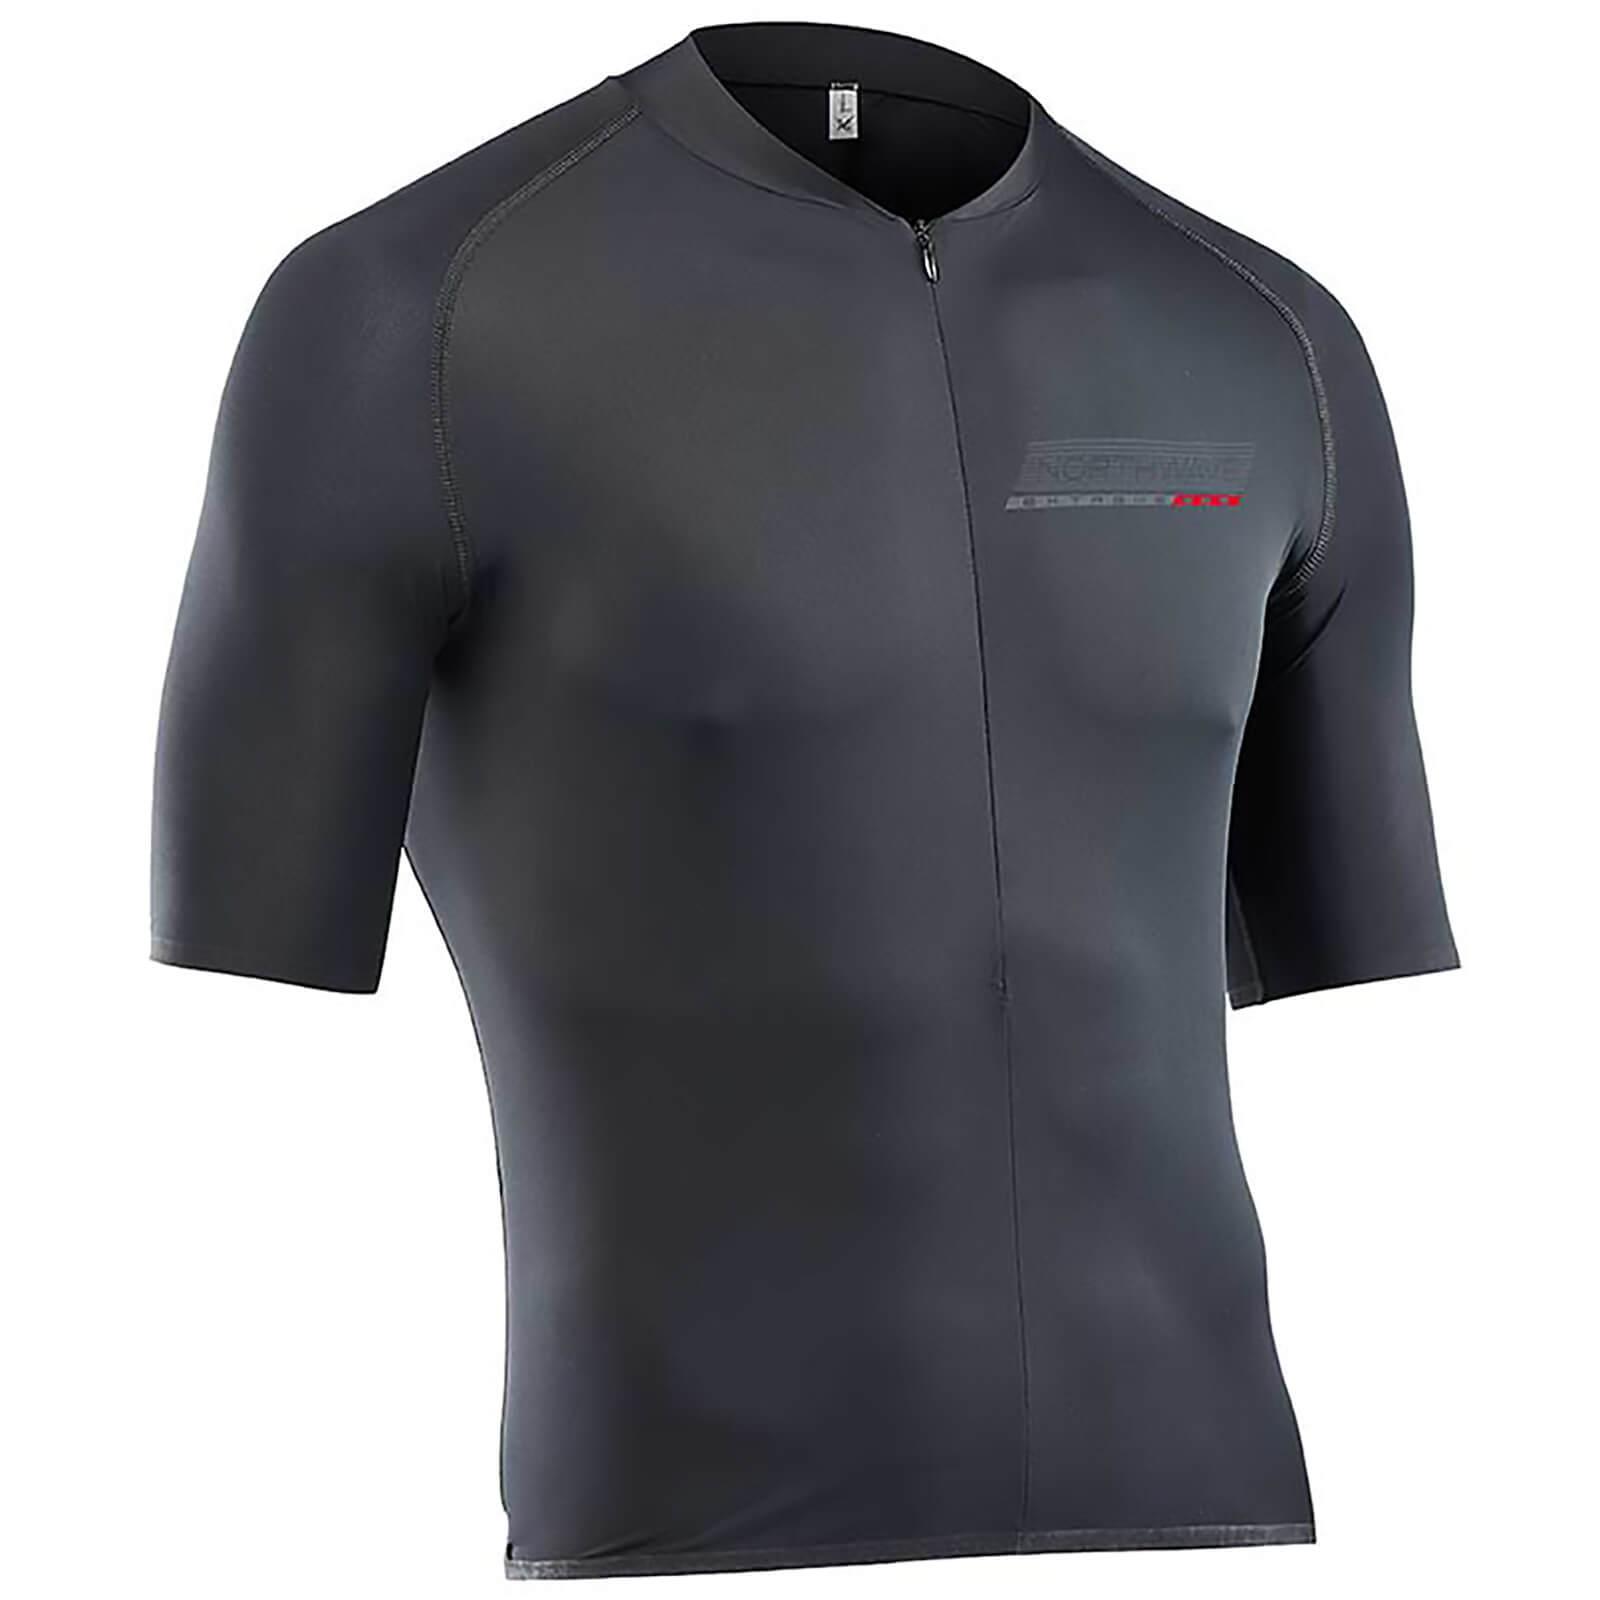 innovative design 0a92c 6b29d Northwave Extreme 68G Full Zip Short Sleeve Jersey - Black   ProBikeKit.com